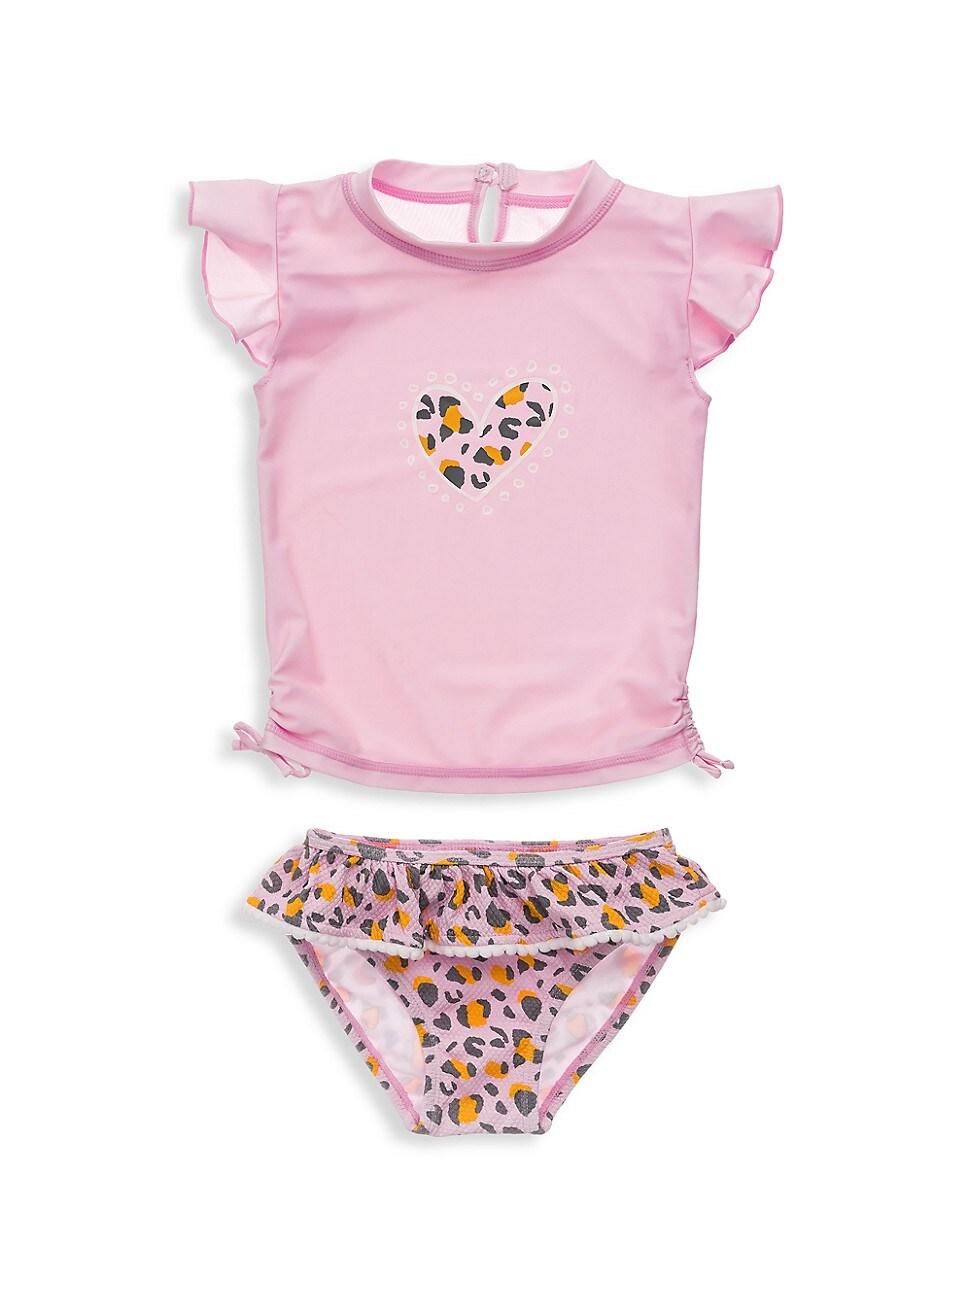 Snapper Rock Bikinis BABY GIRL'S LEOPARD LOVE TWO-PIECE TOP & RUFFLE BOTTOM SET